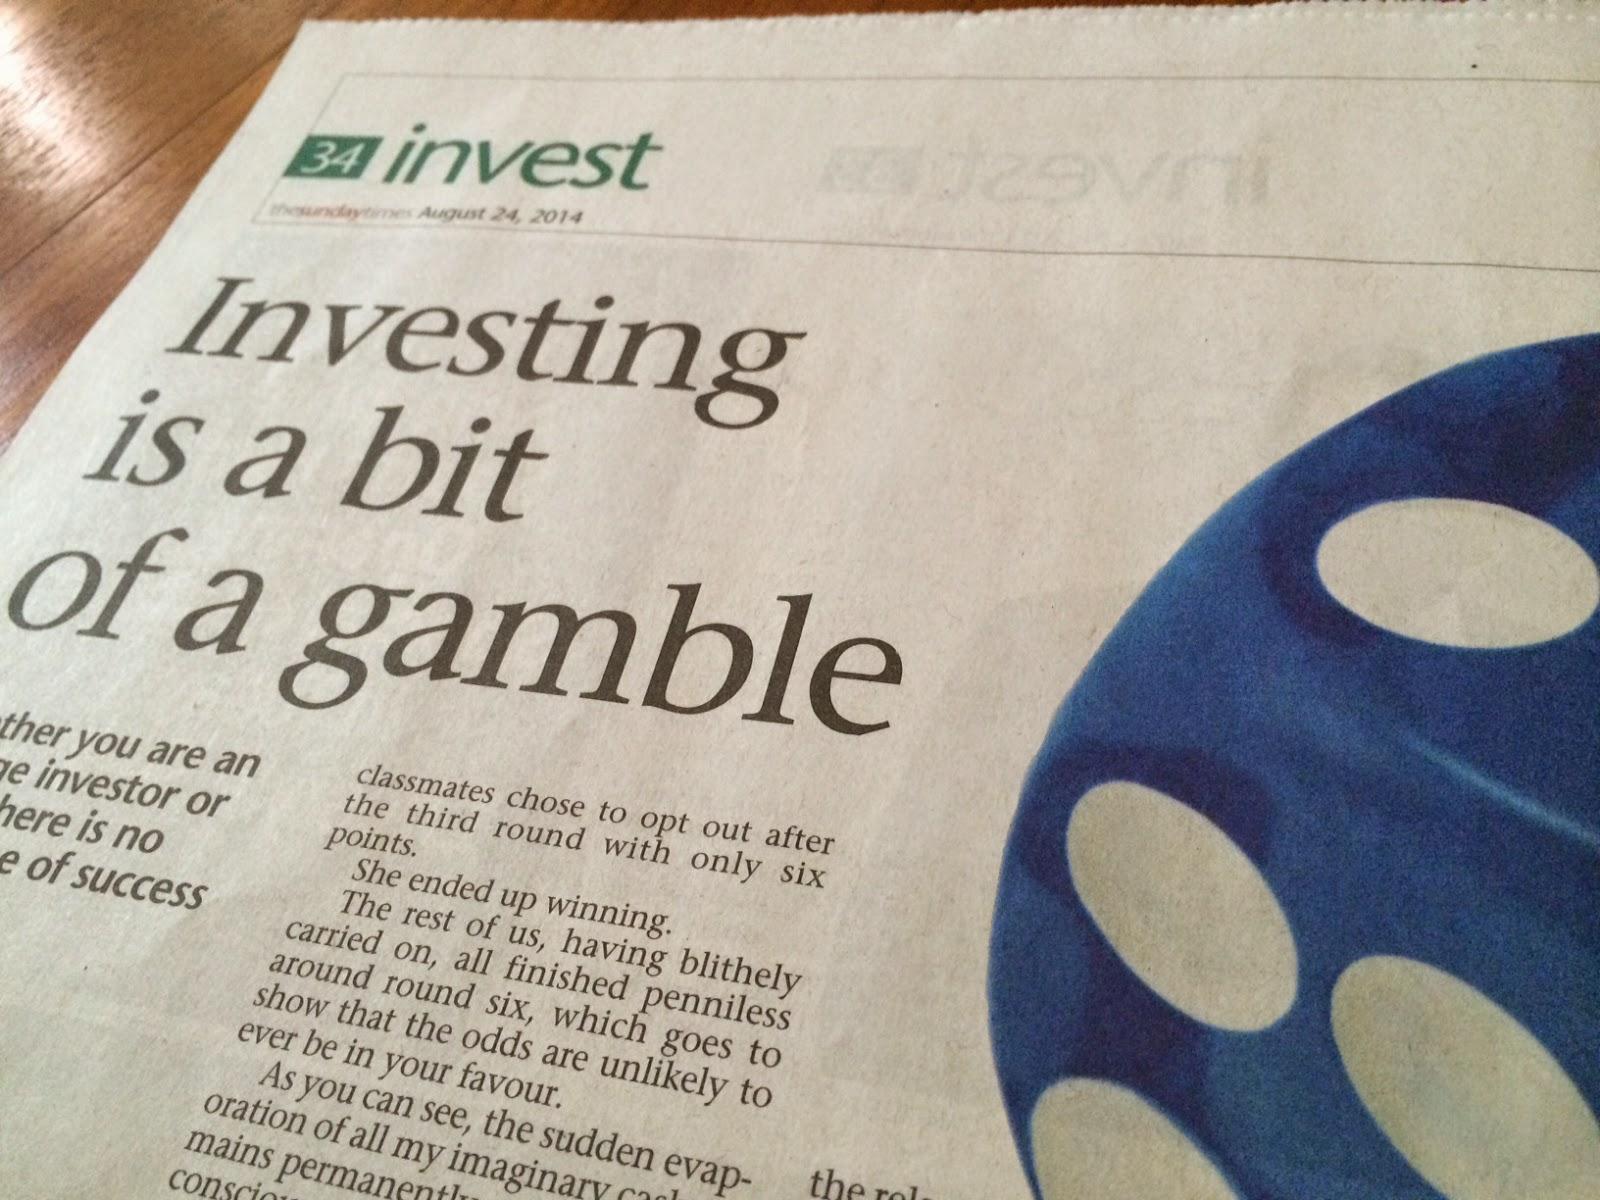 Investing = Gambling